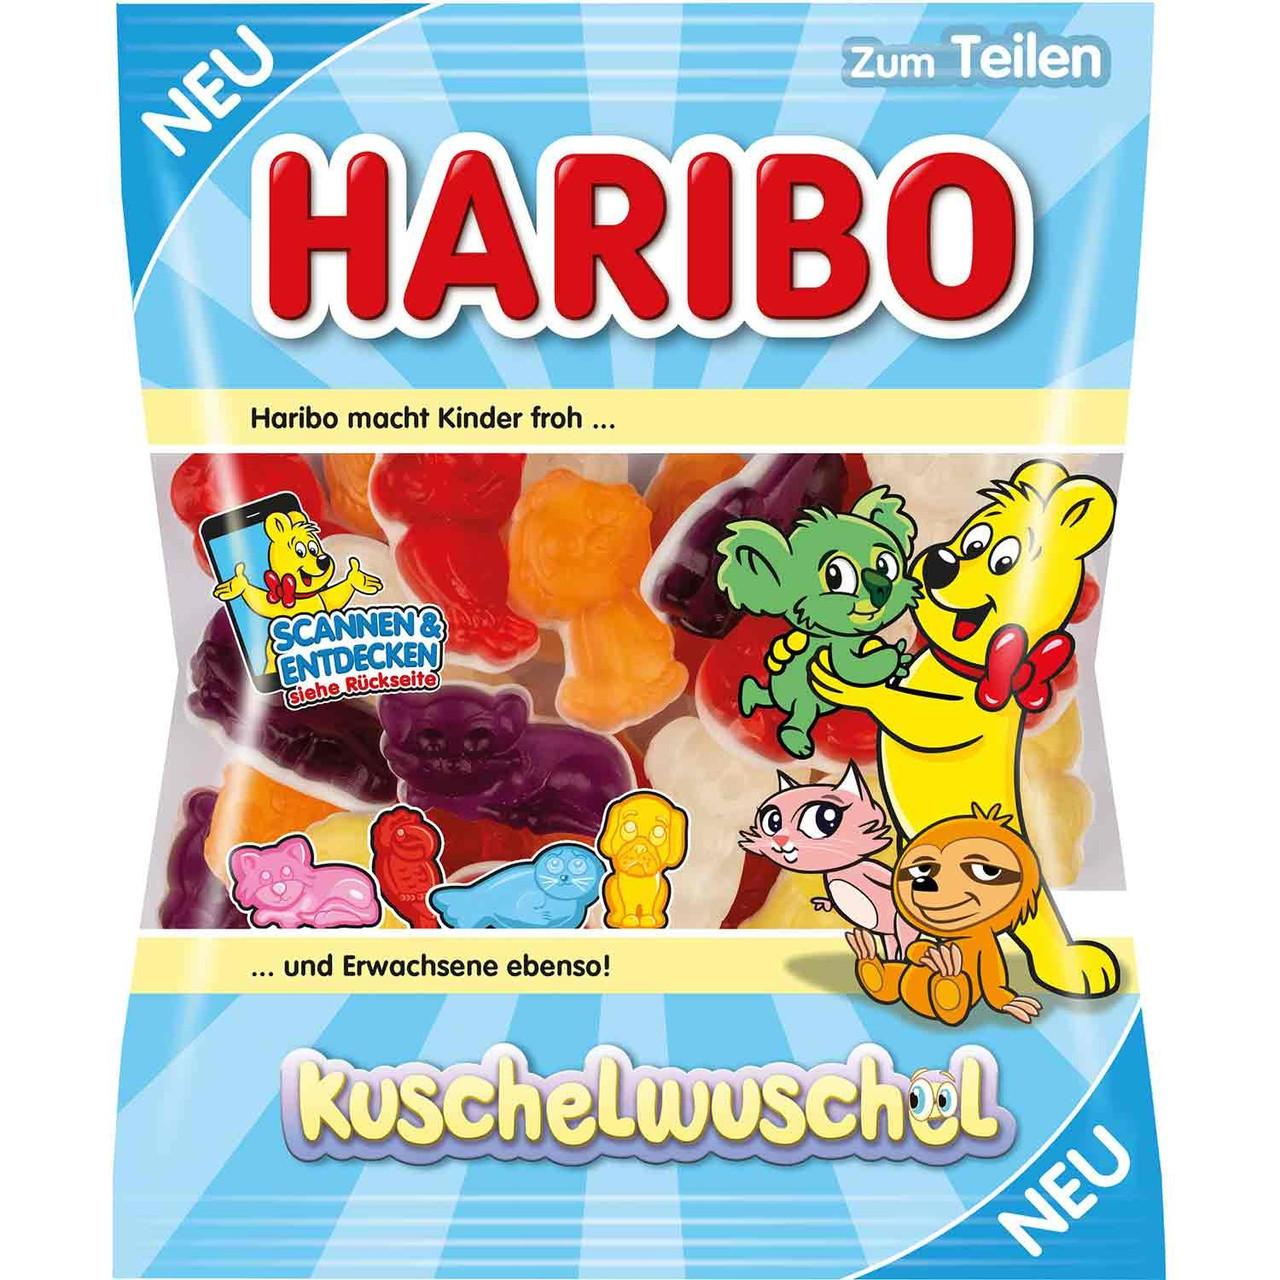 Haribo Kuschelwuschhel 175 g